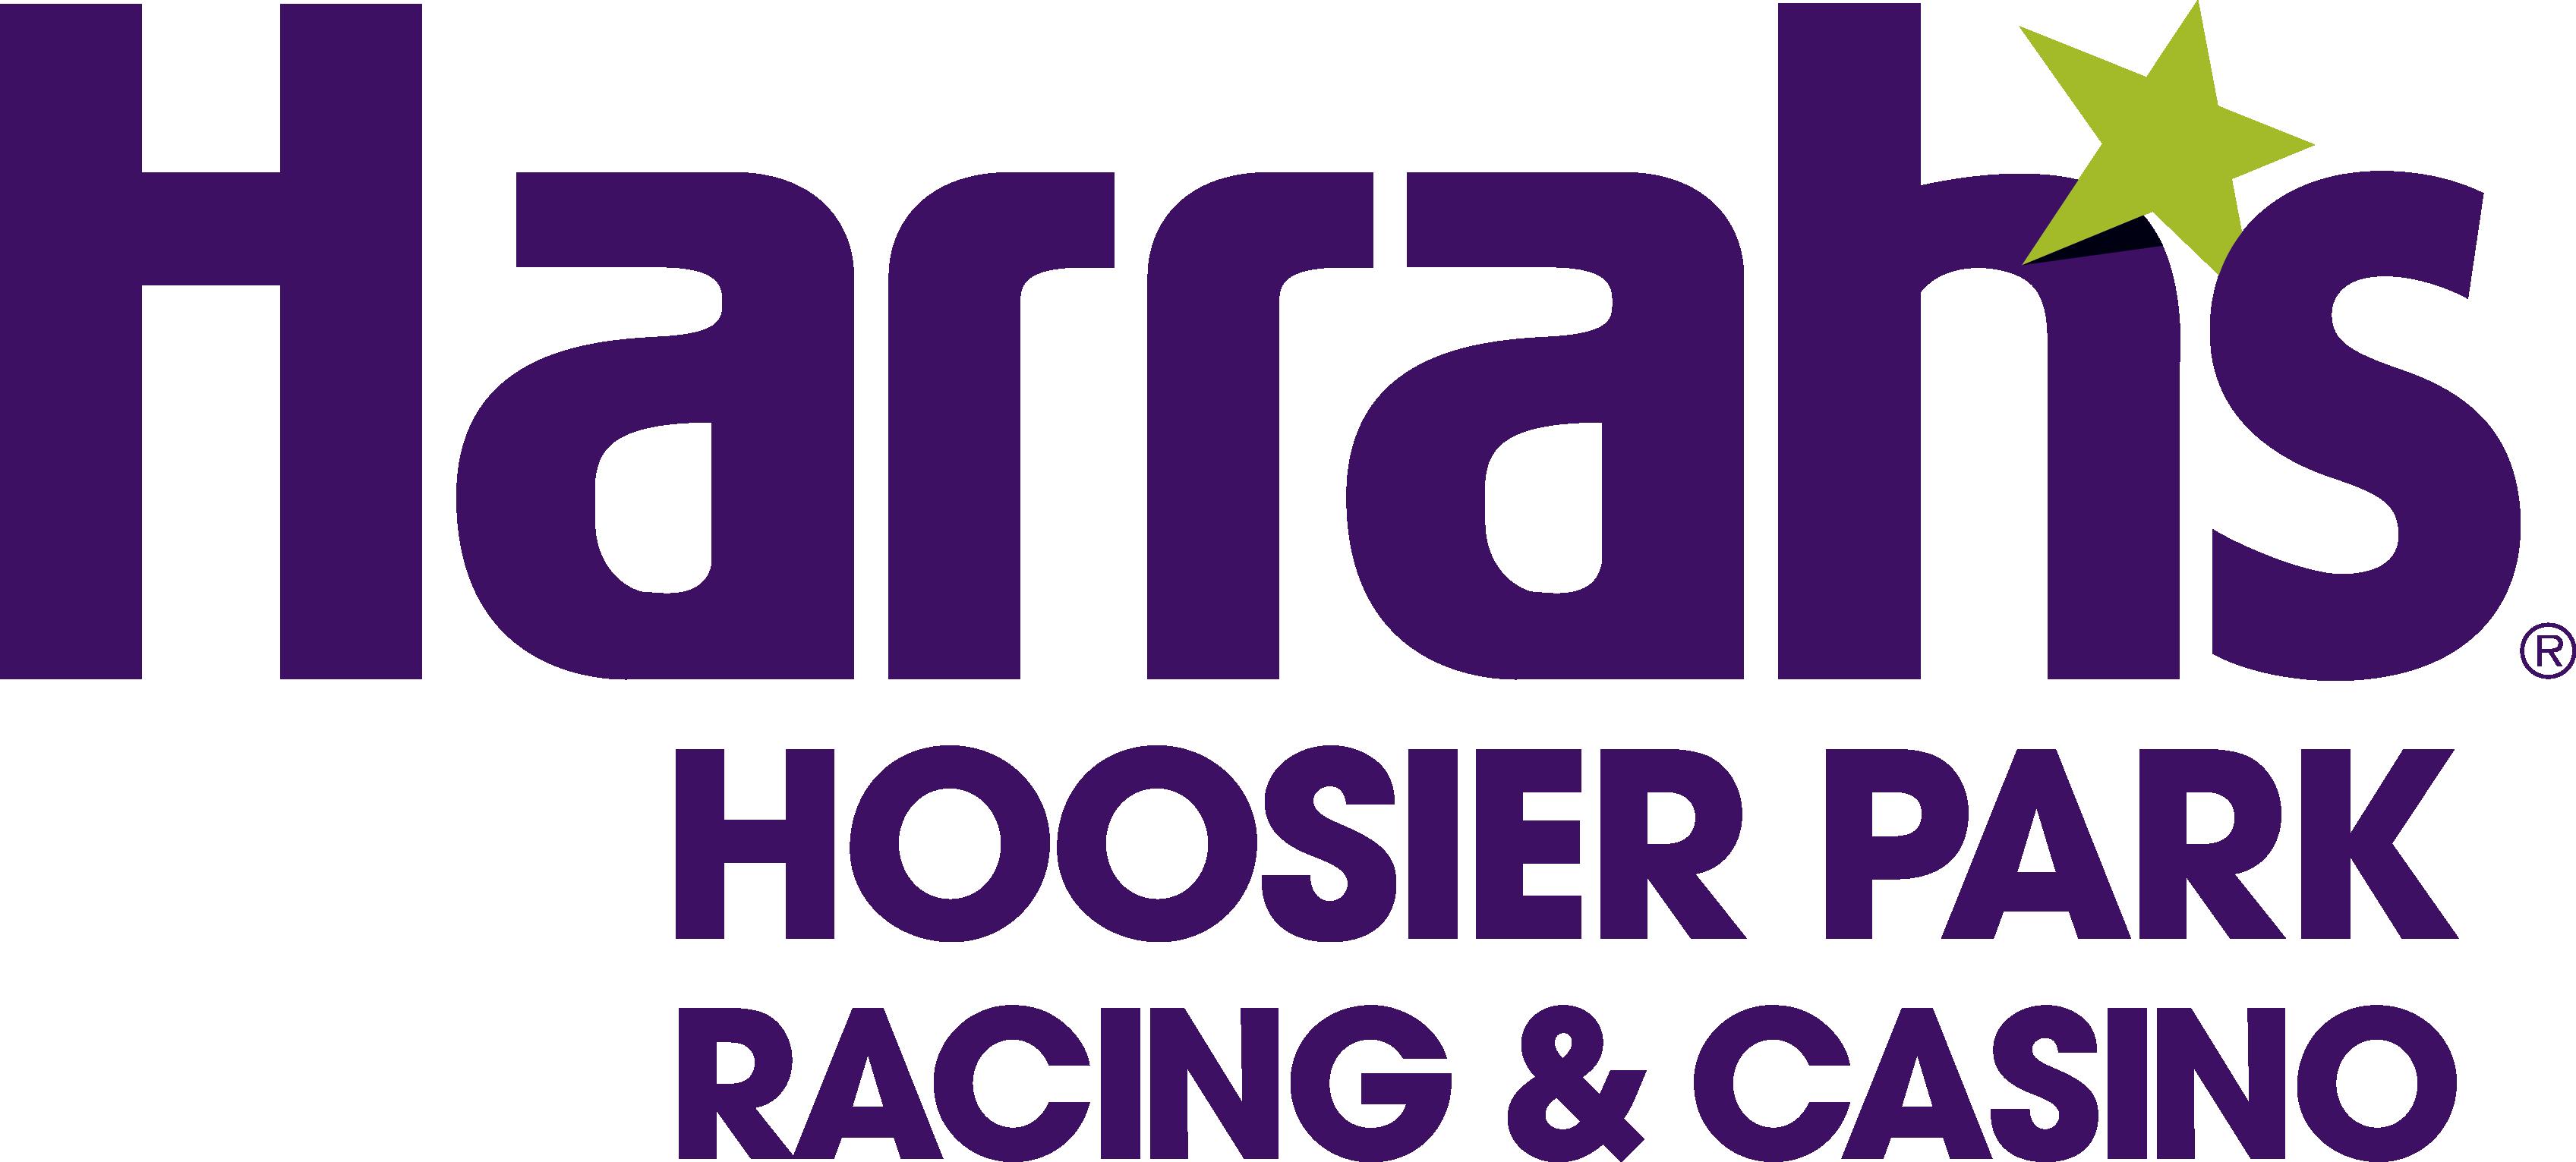 Harrahs_HoosierPark_Racing&Casino_Purple_4c